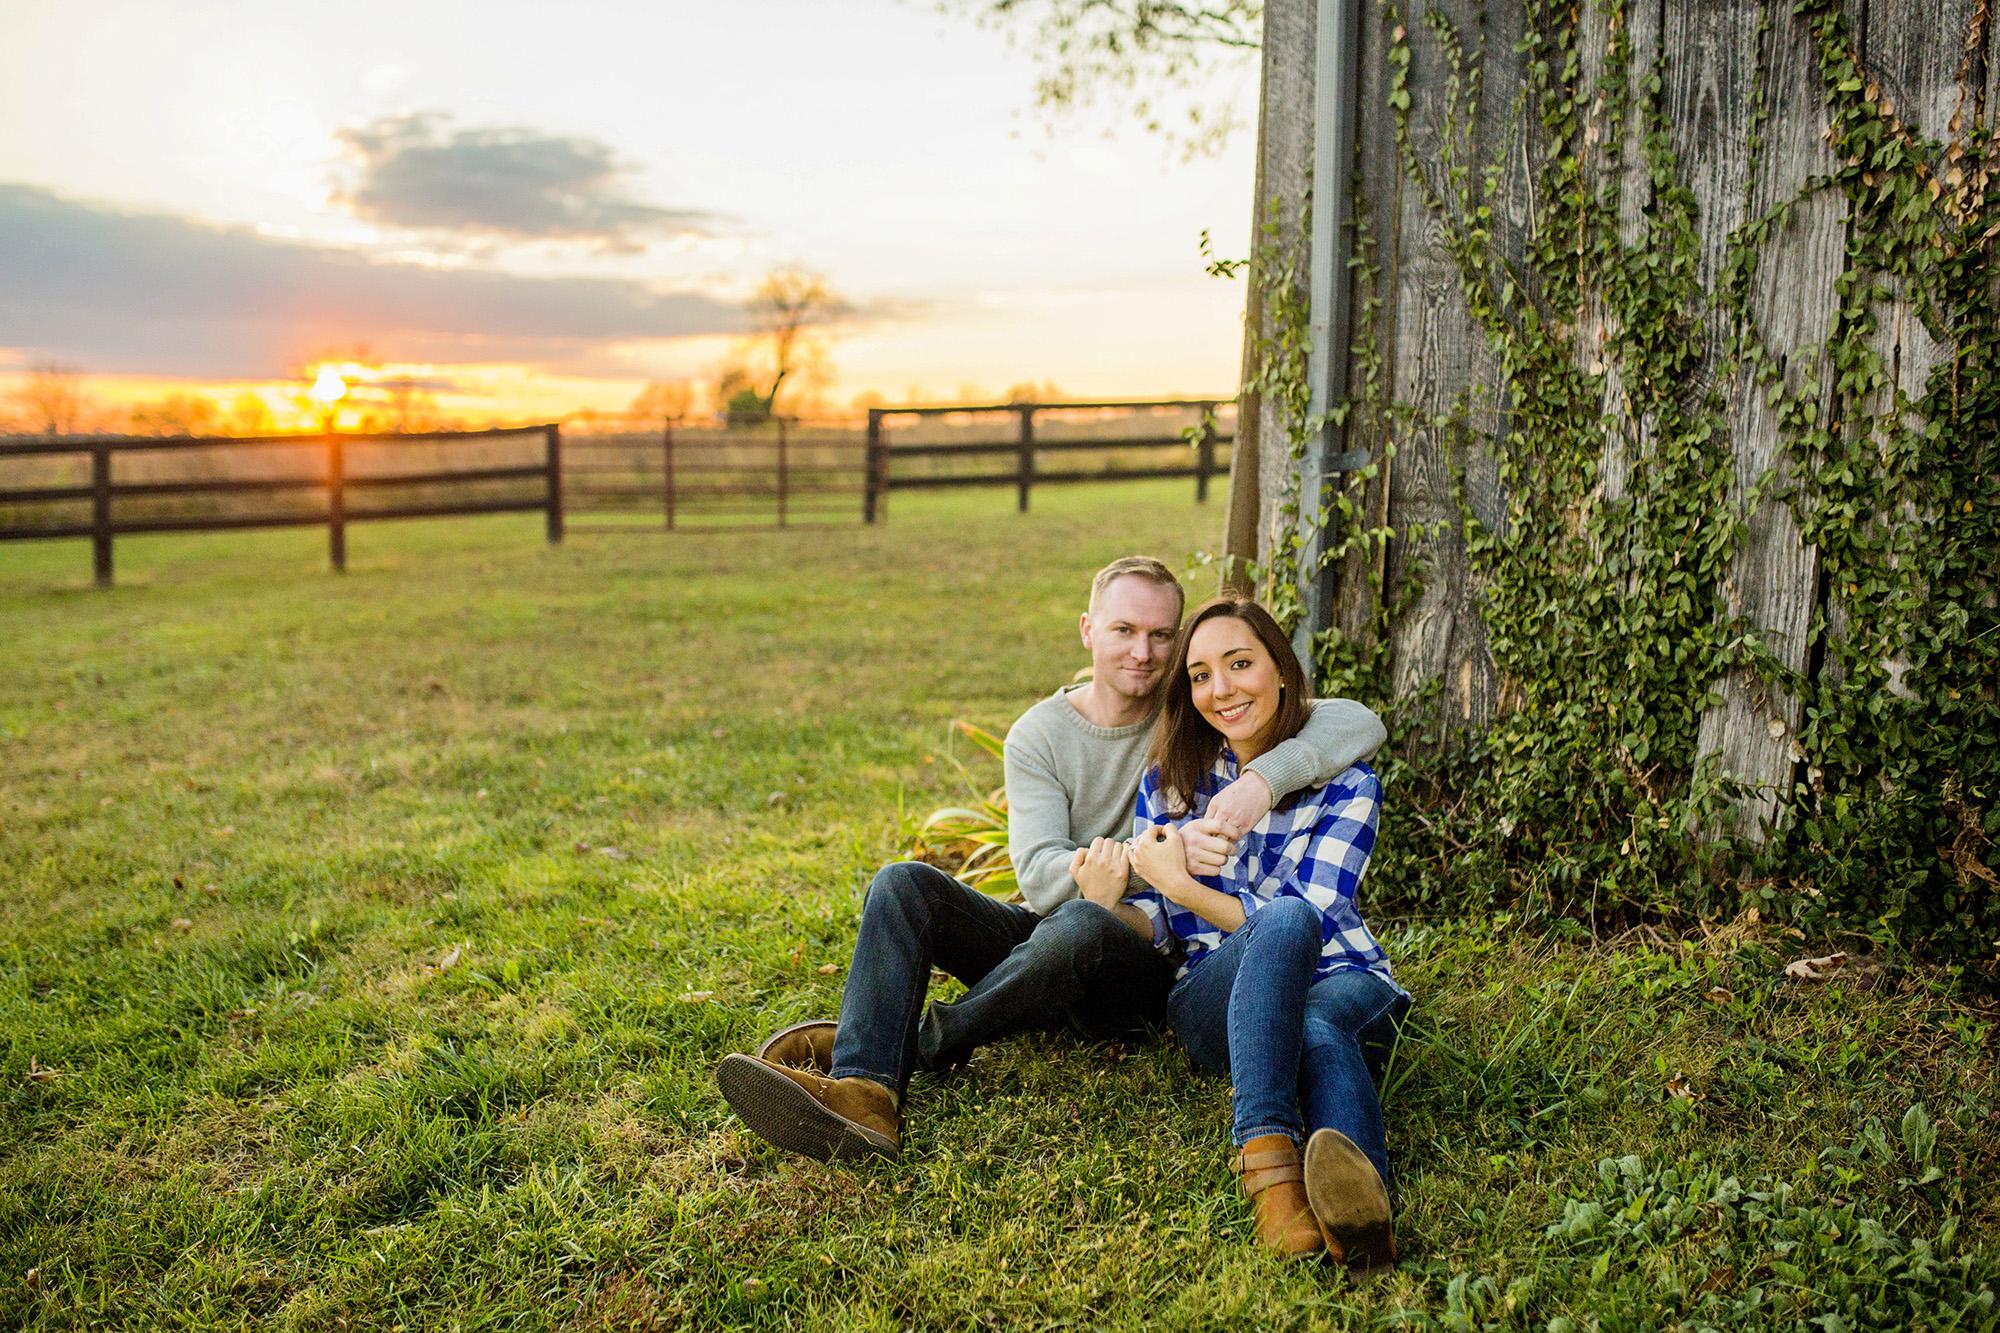 Seriously_Sabrina_Photography_Lexington_Kentucky_Backroads_Roadtrip_Engagement_RM090.jpg